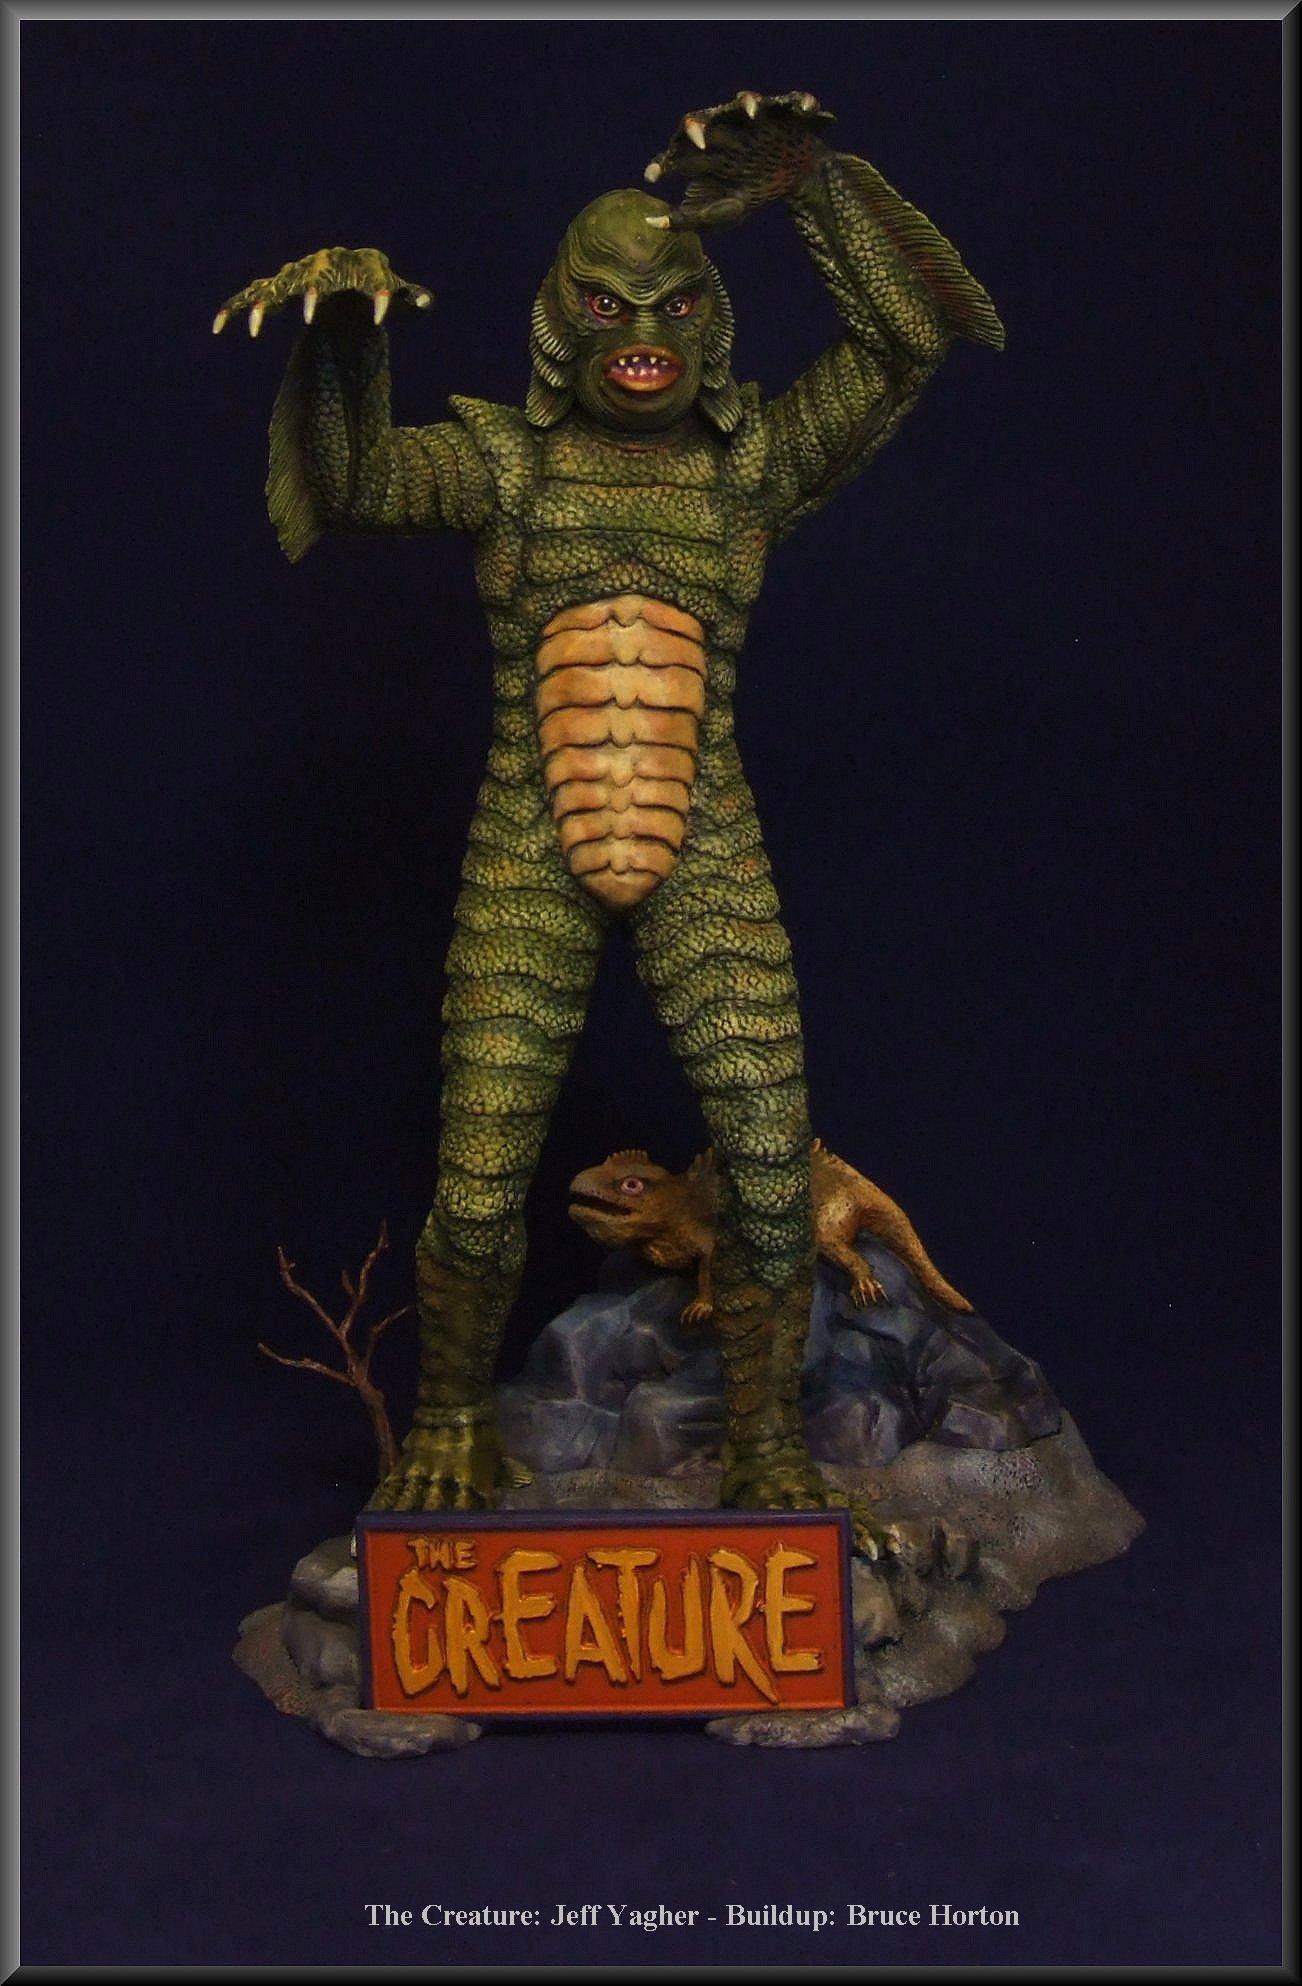 Creature-tribute-1.jpg?1548172810613